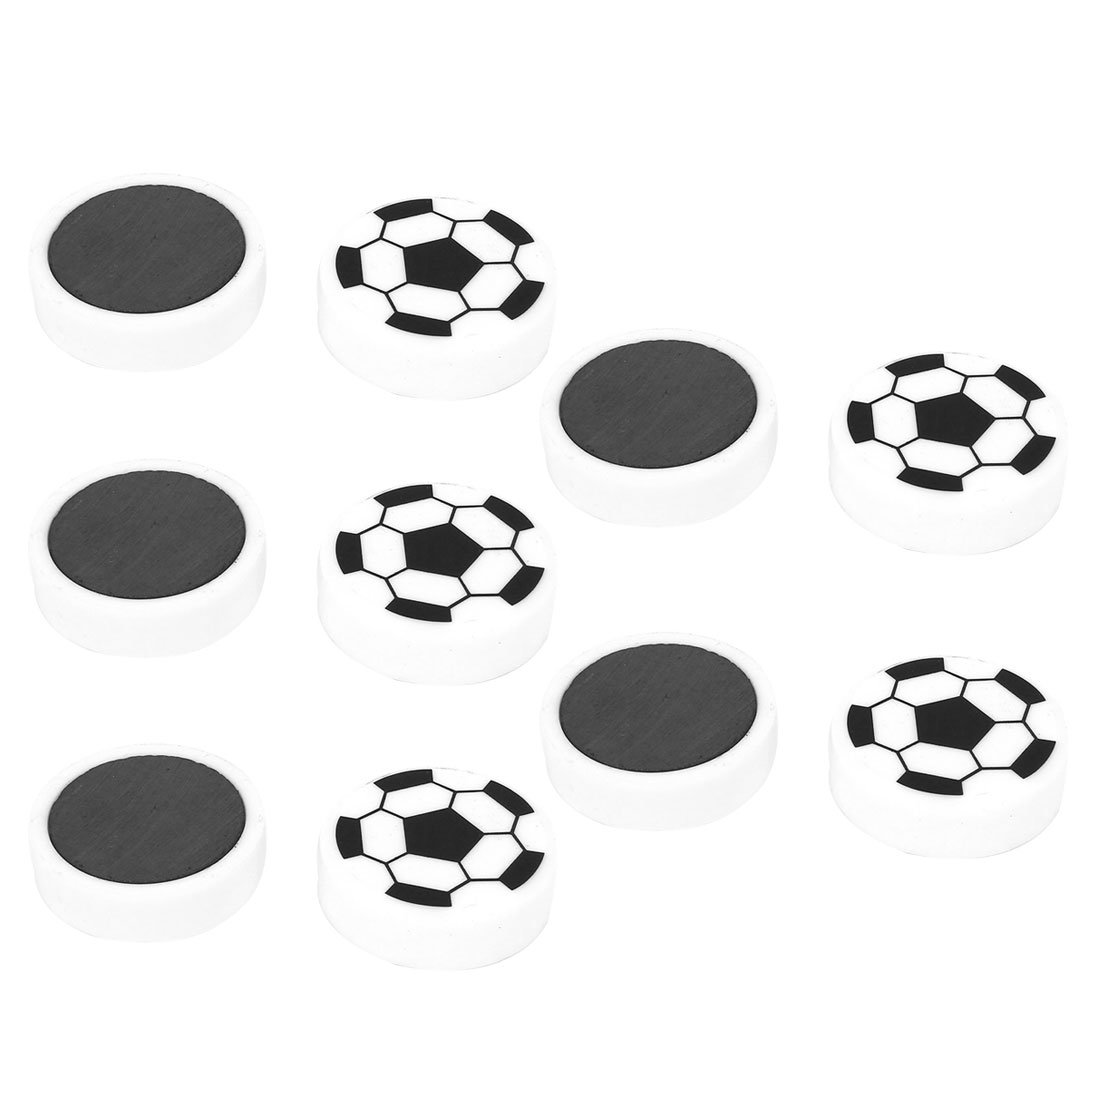 10 Pcs White Black Football Pattern Round Whiteboard Magnetic Sticker